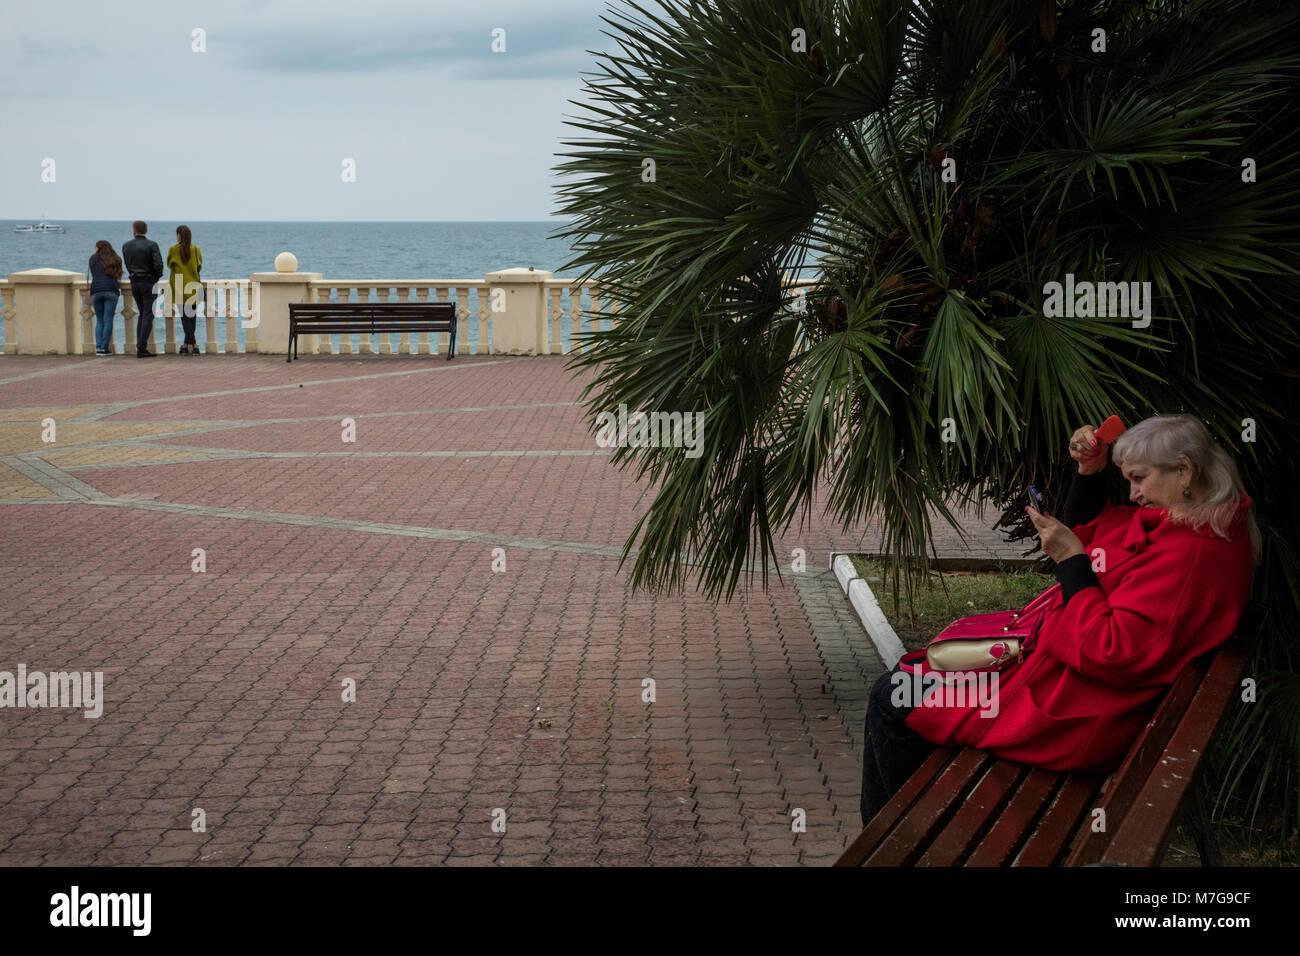 People on Primorskaya Embankment in central Sochi city, Russia - Stock Image